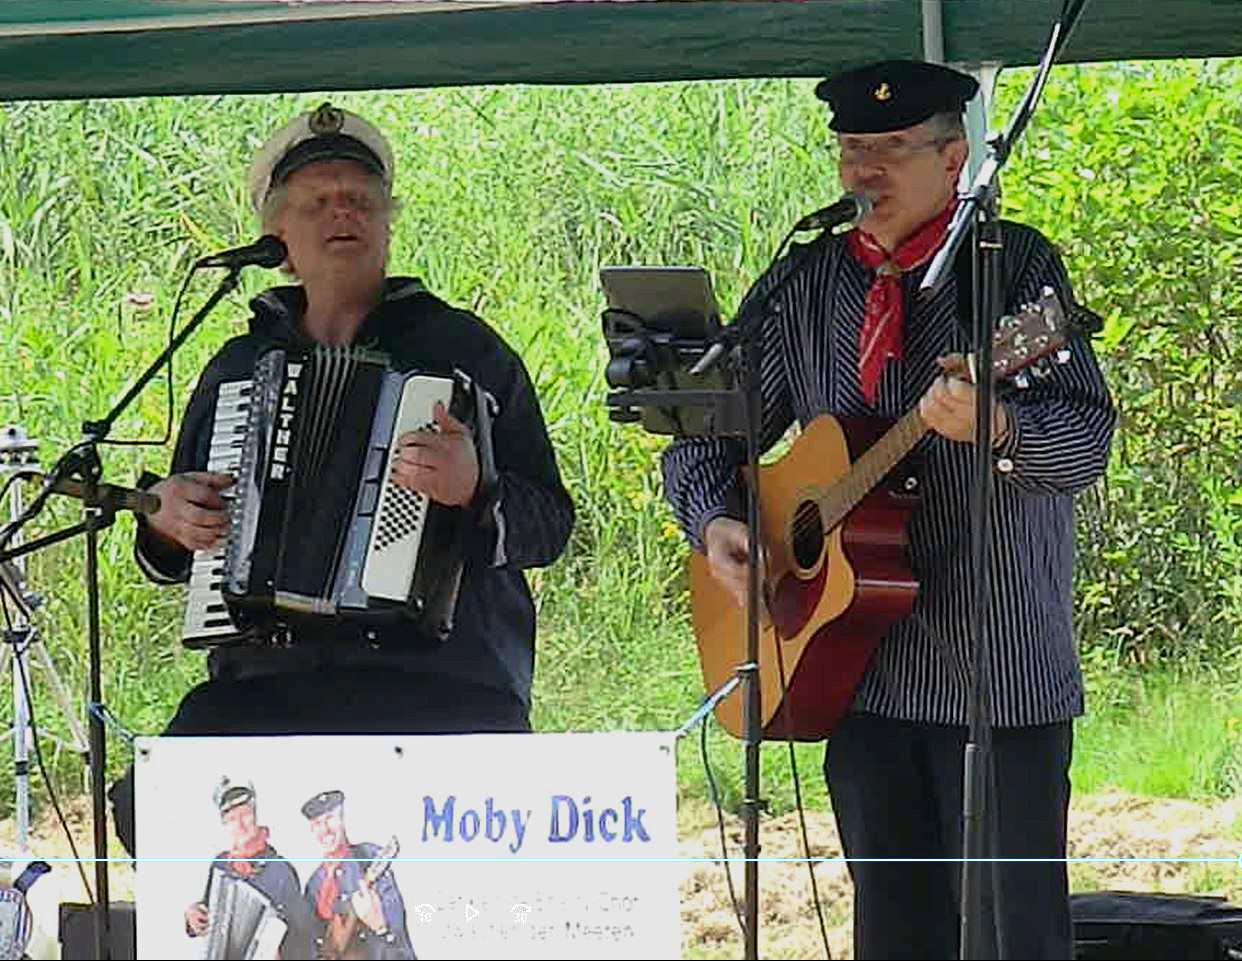 Moby Dick beim 1 Segeberger Shanty-Fest-1.JPG